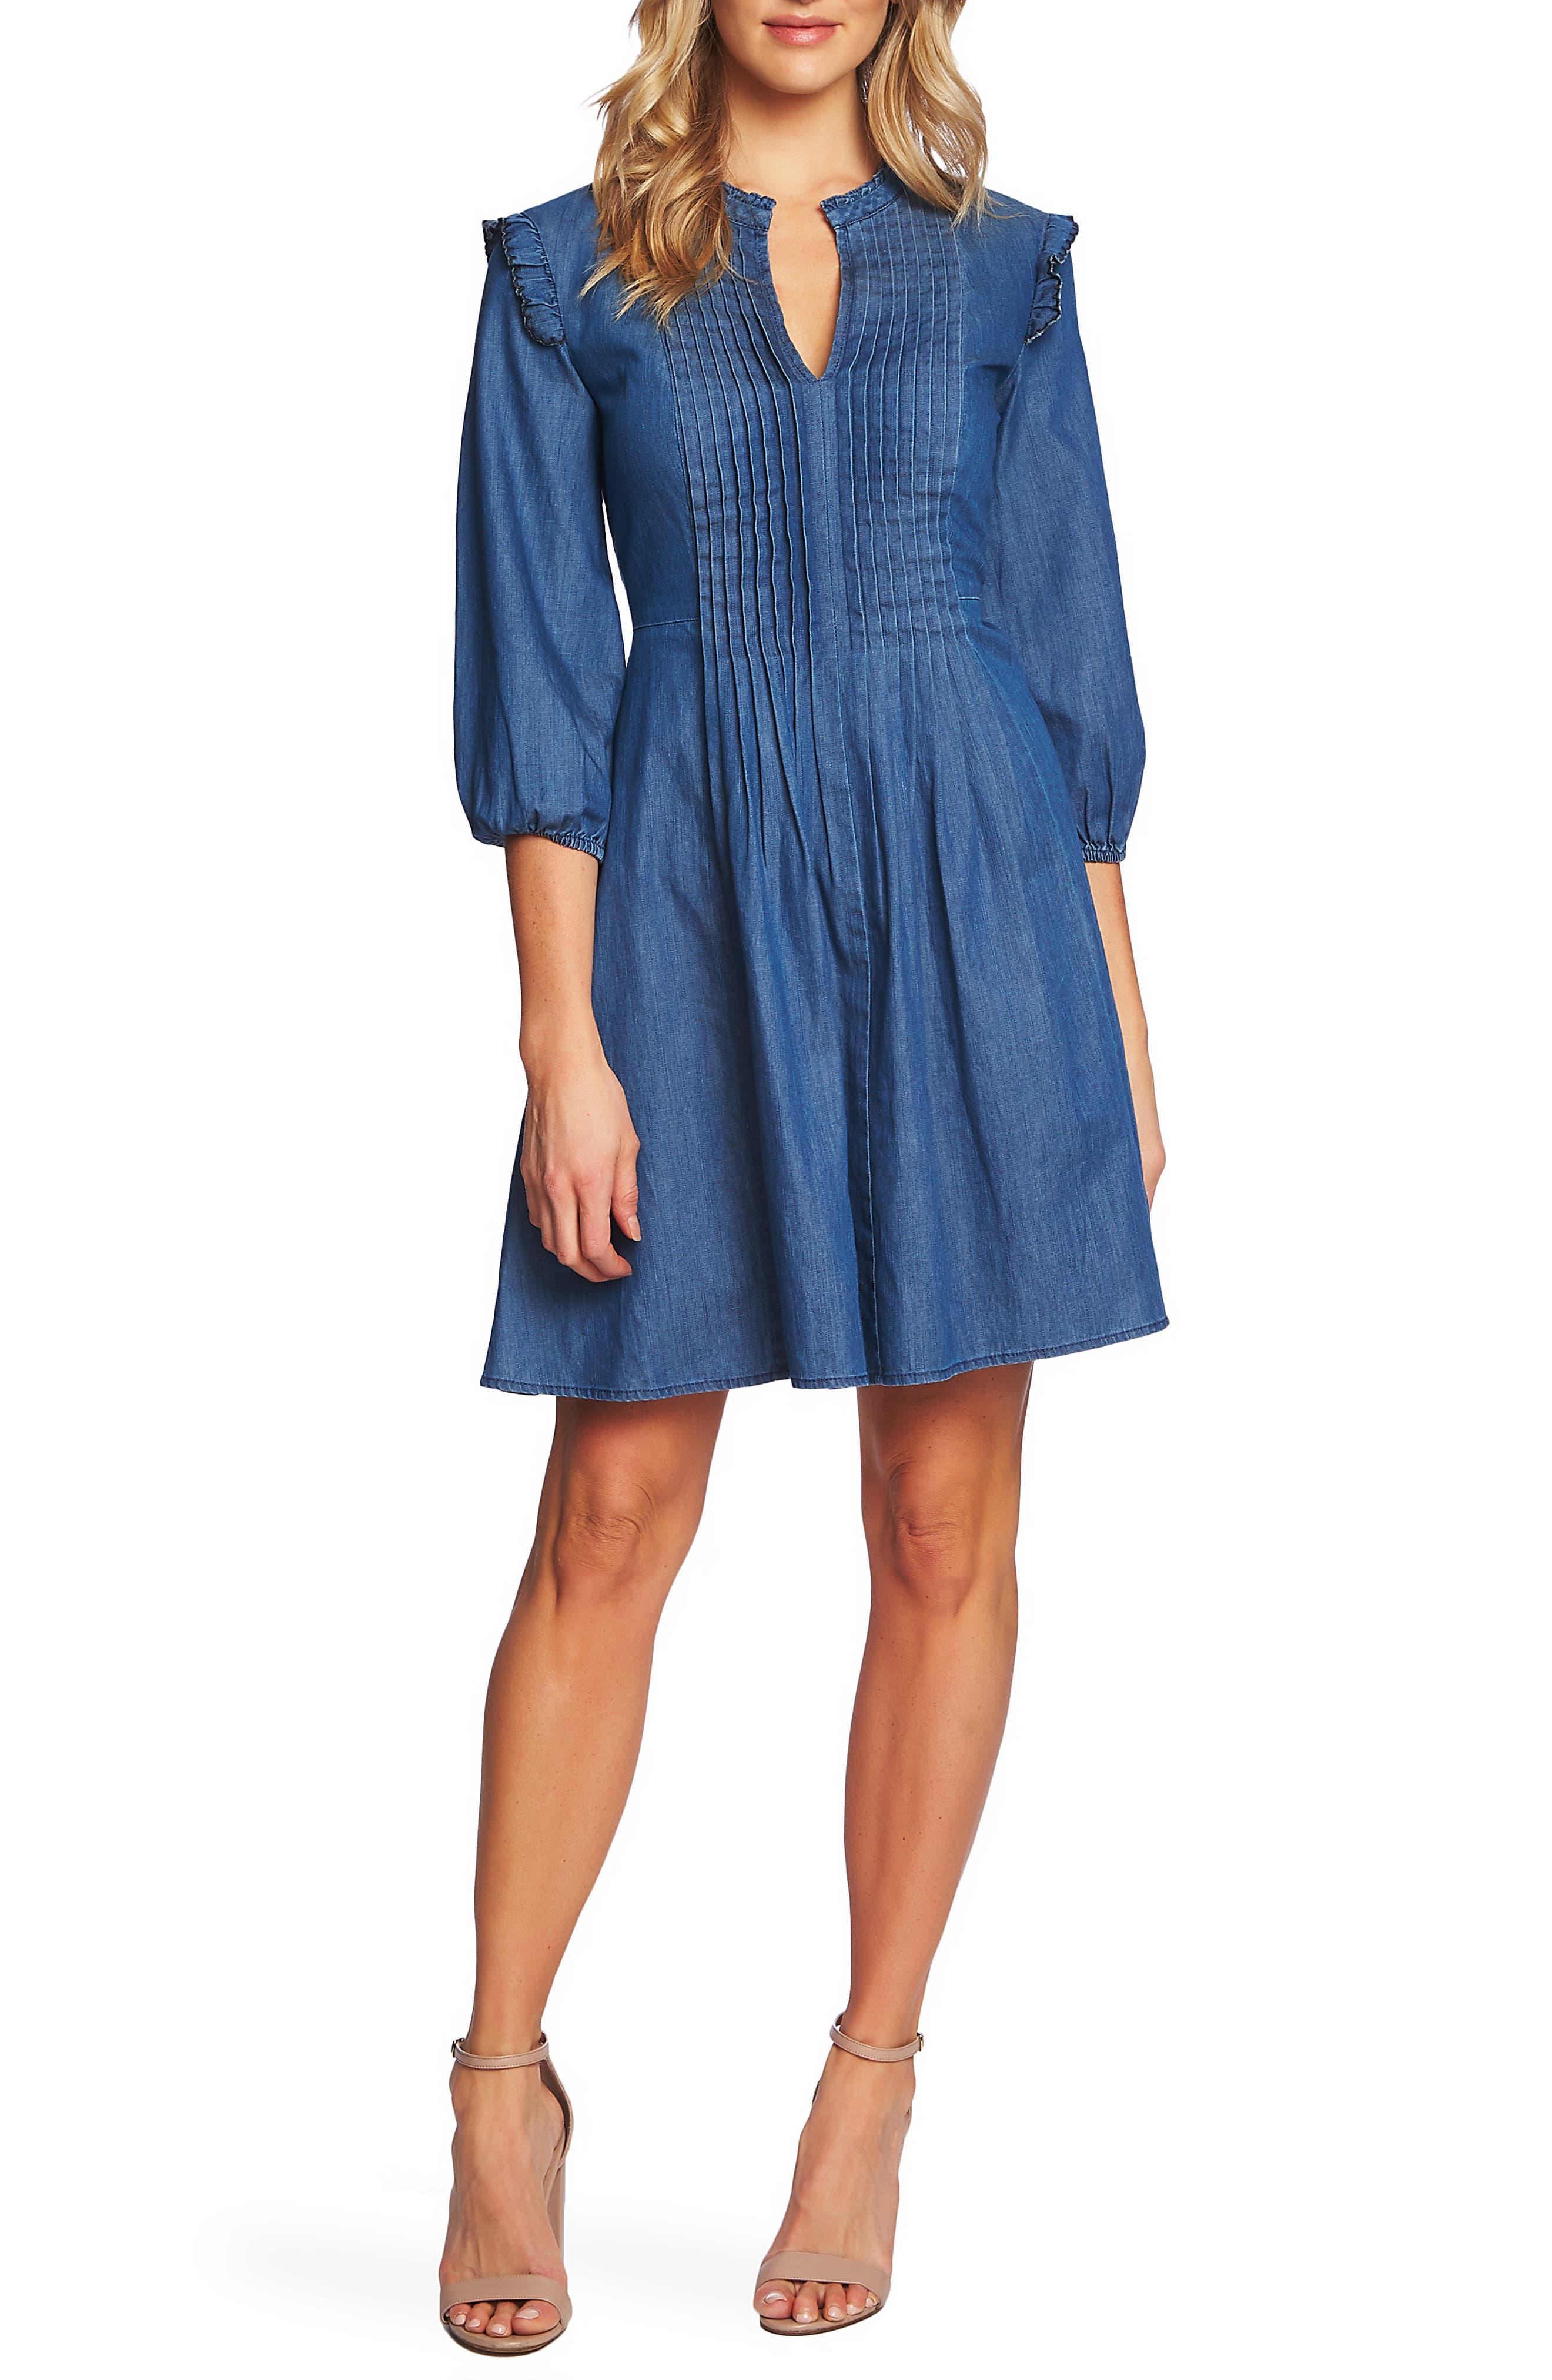 Pintuck Ruffle Denim Dress,                             Main thumbnail 1, color,                             AUTHENTIC